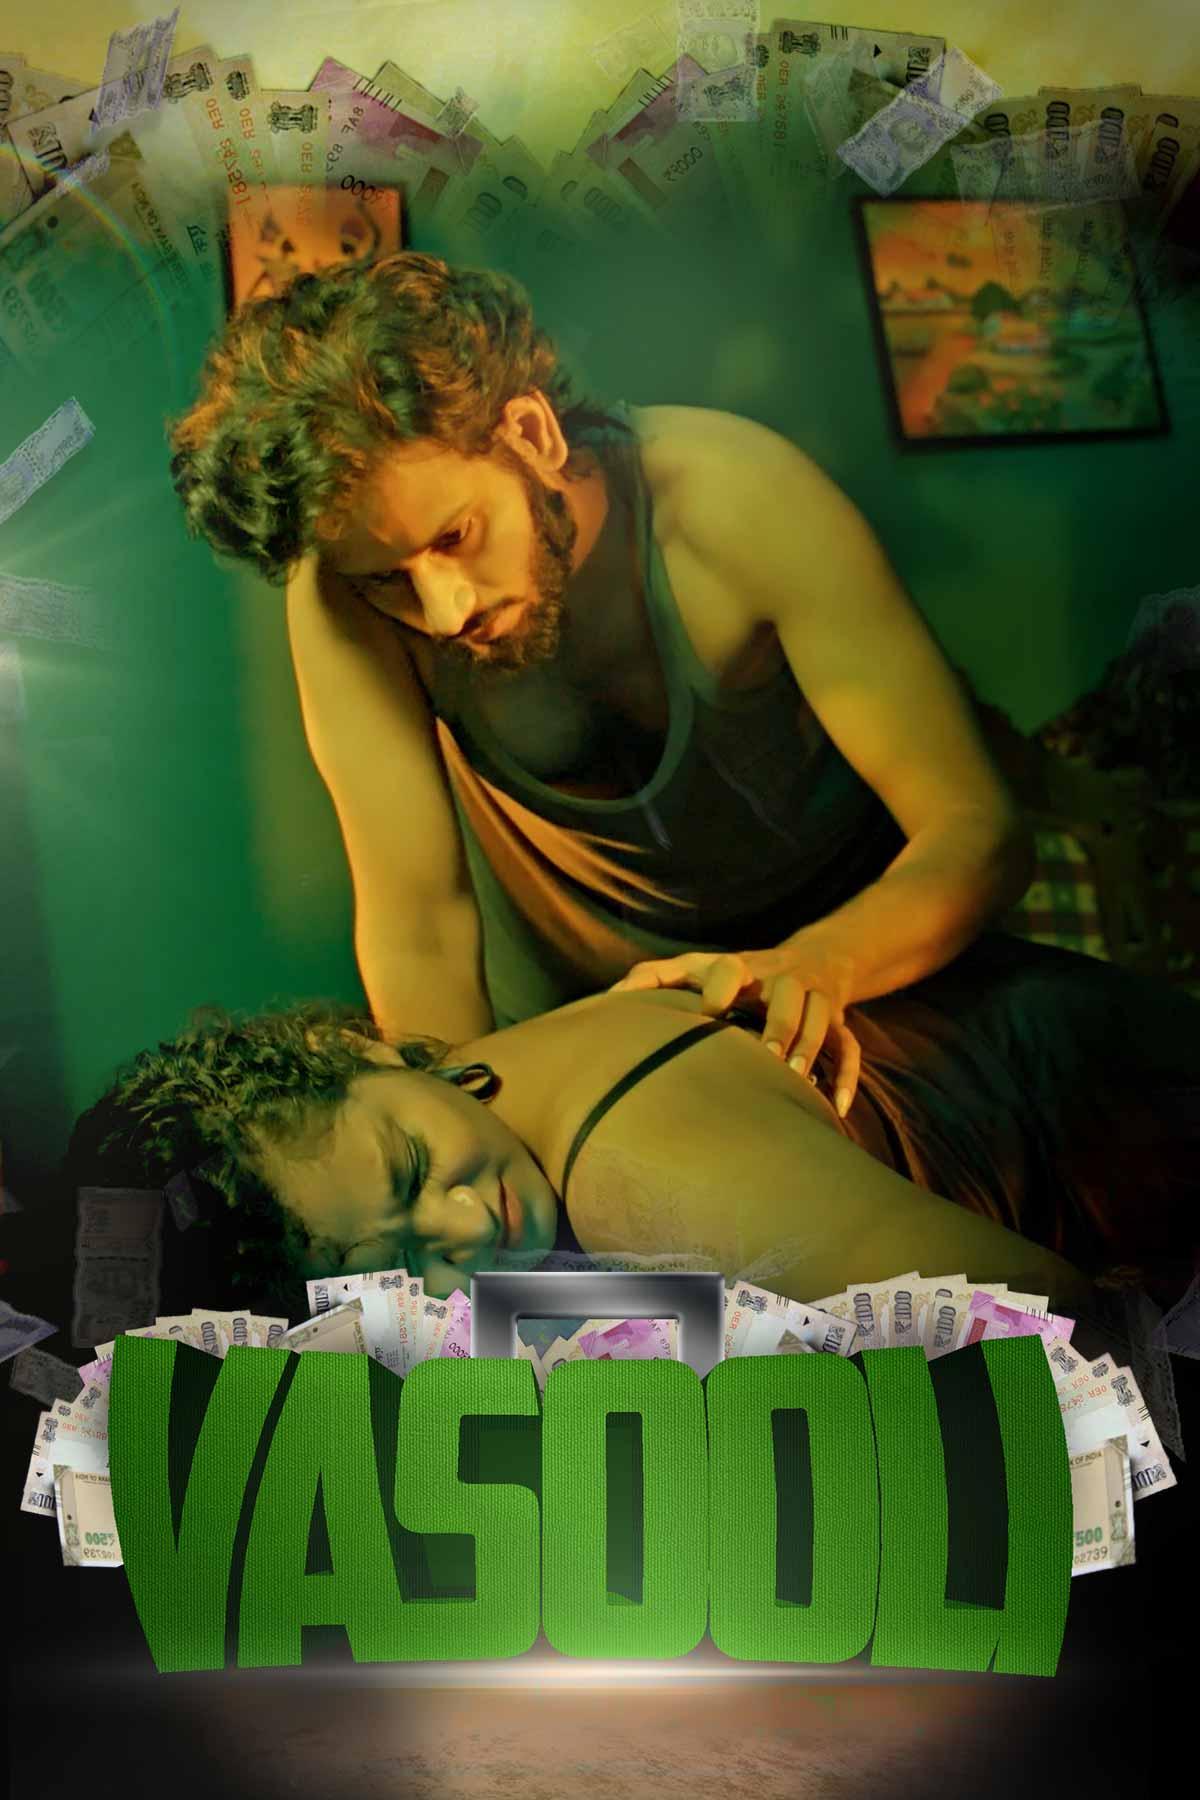 Vasooli S01 (2021) Hindi Kuku Series 720p | 480p WEB-HD x264